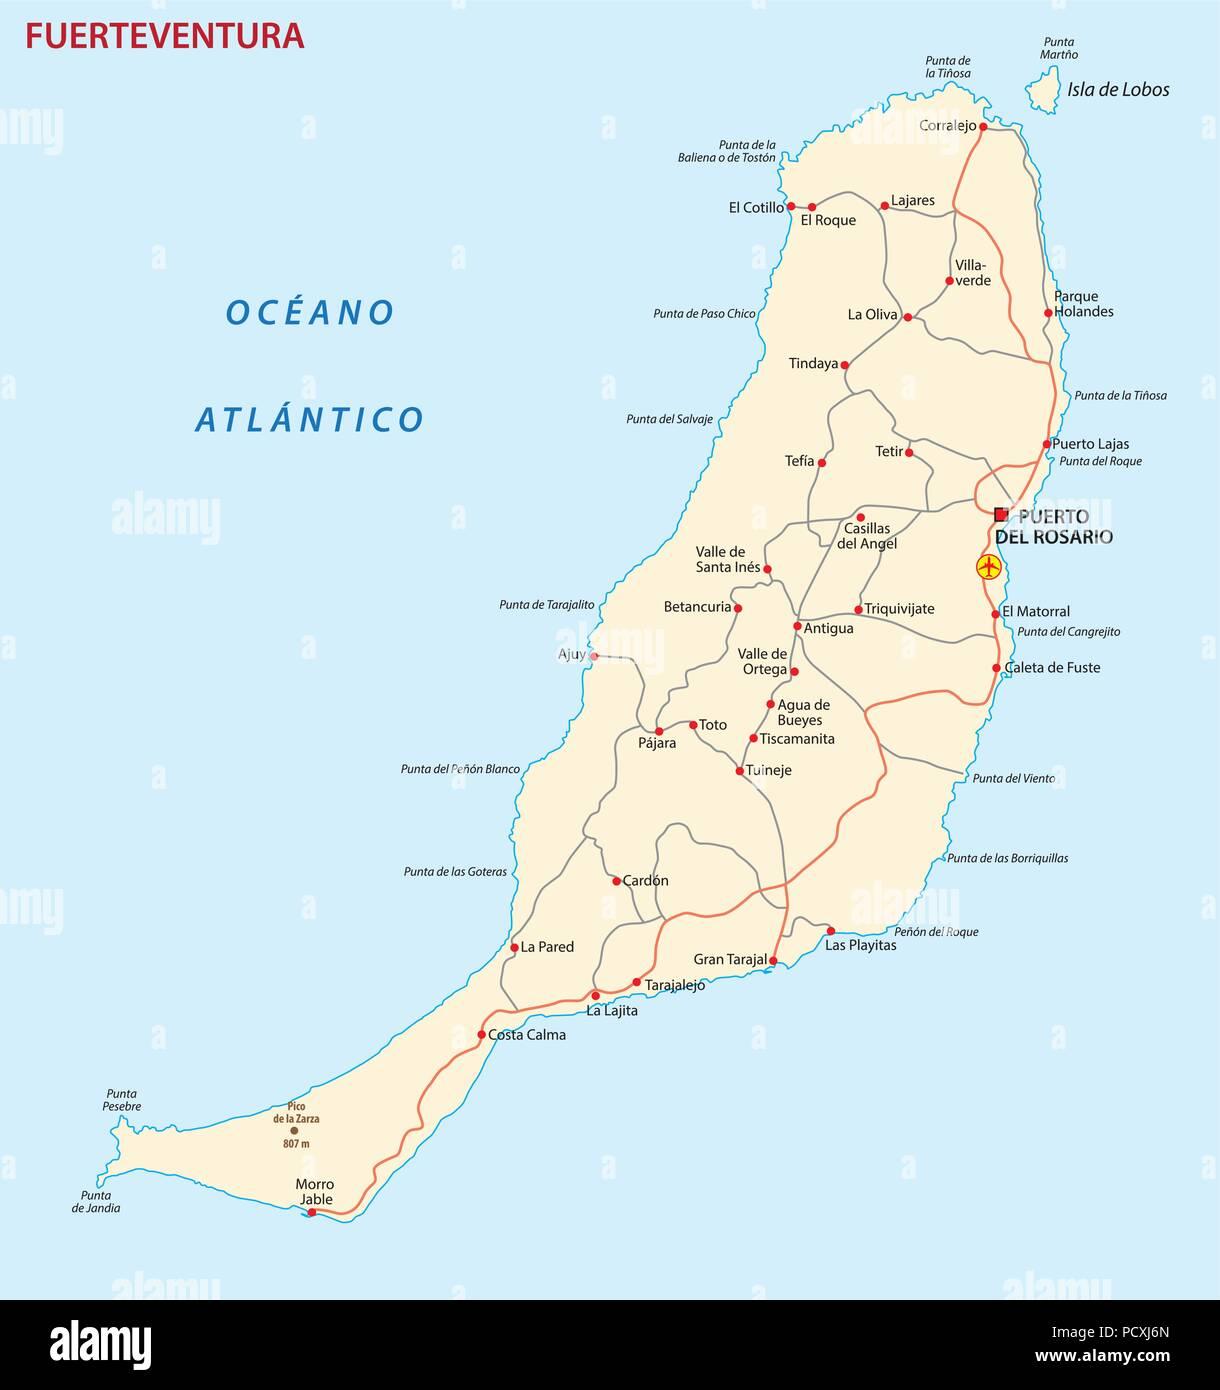 Cartina Spagna Fuerteventura.Fuerteventura Map Immagini E Fotos Stock Alamy